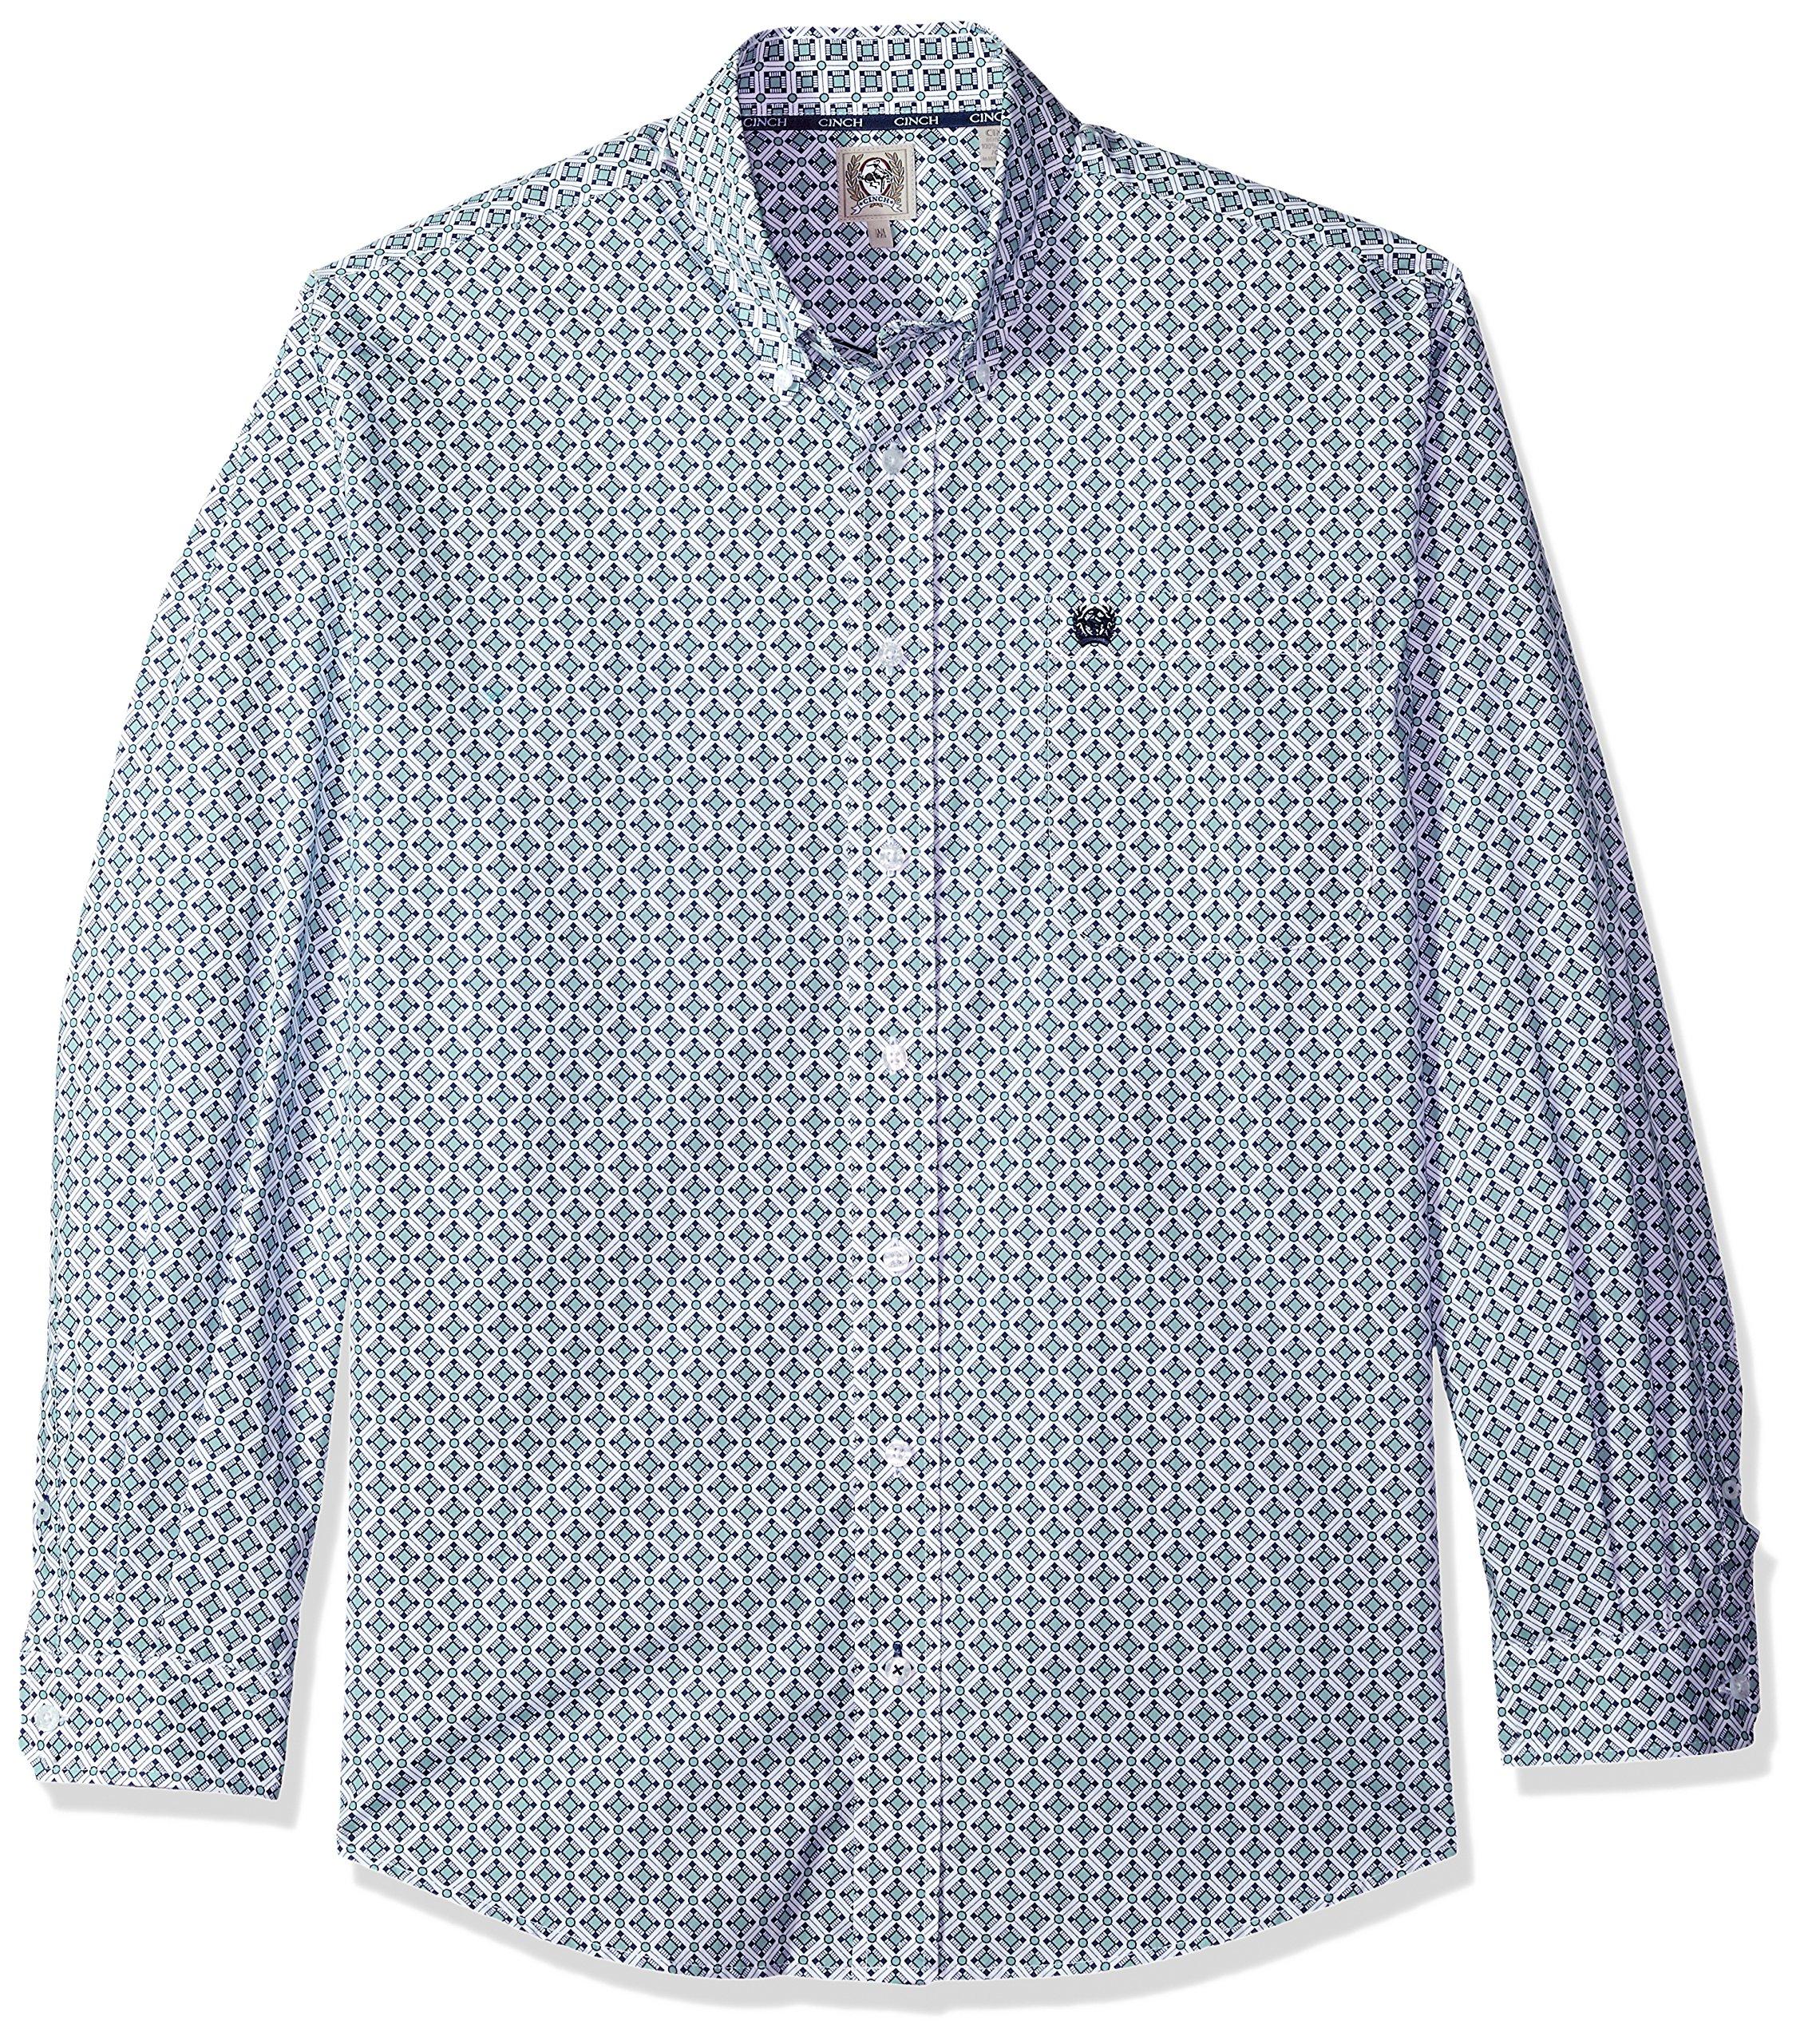 Cinch Men's Classic Fit Long Sleeve Button One Open Pocket Print Shirt, White/Light Blue, M